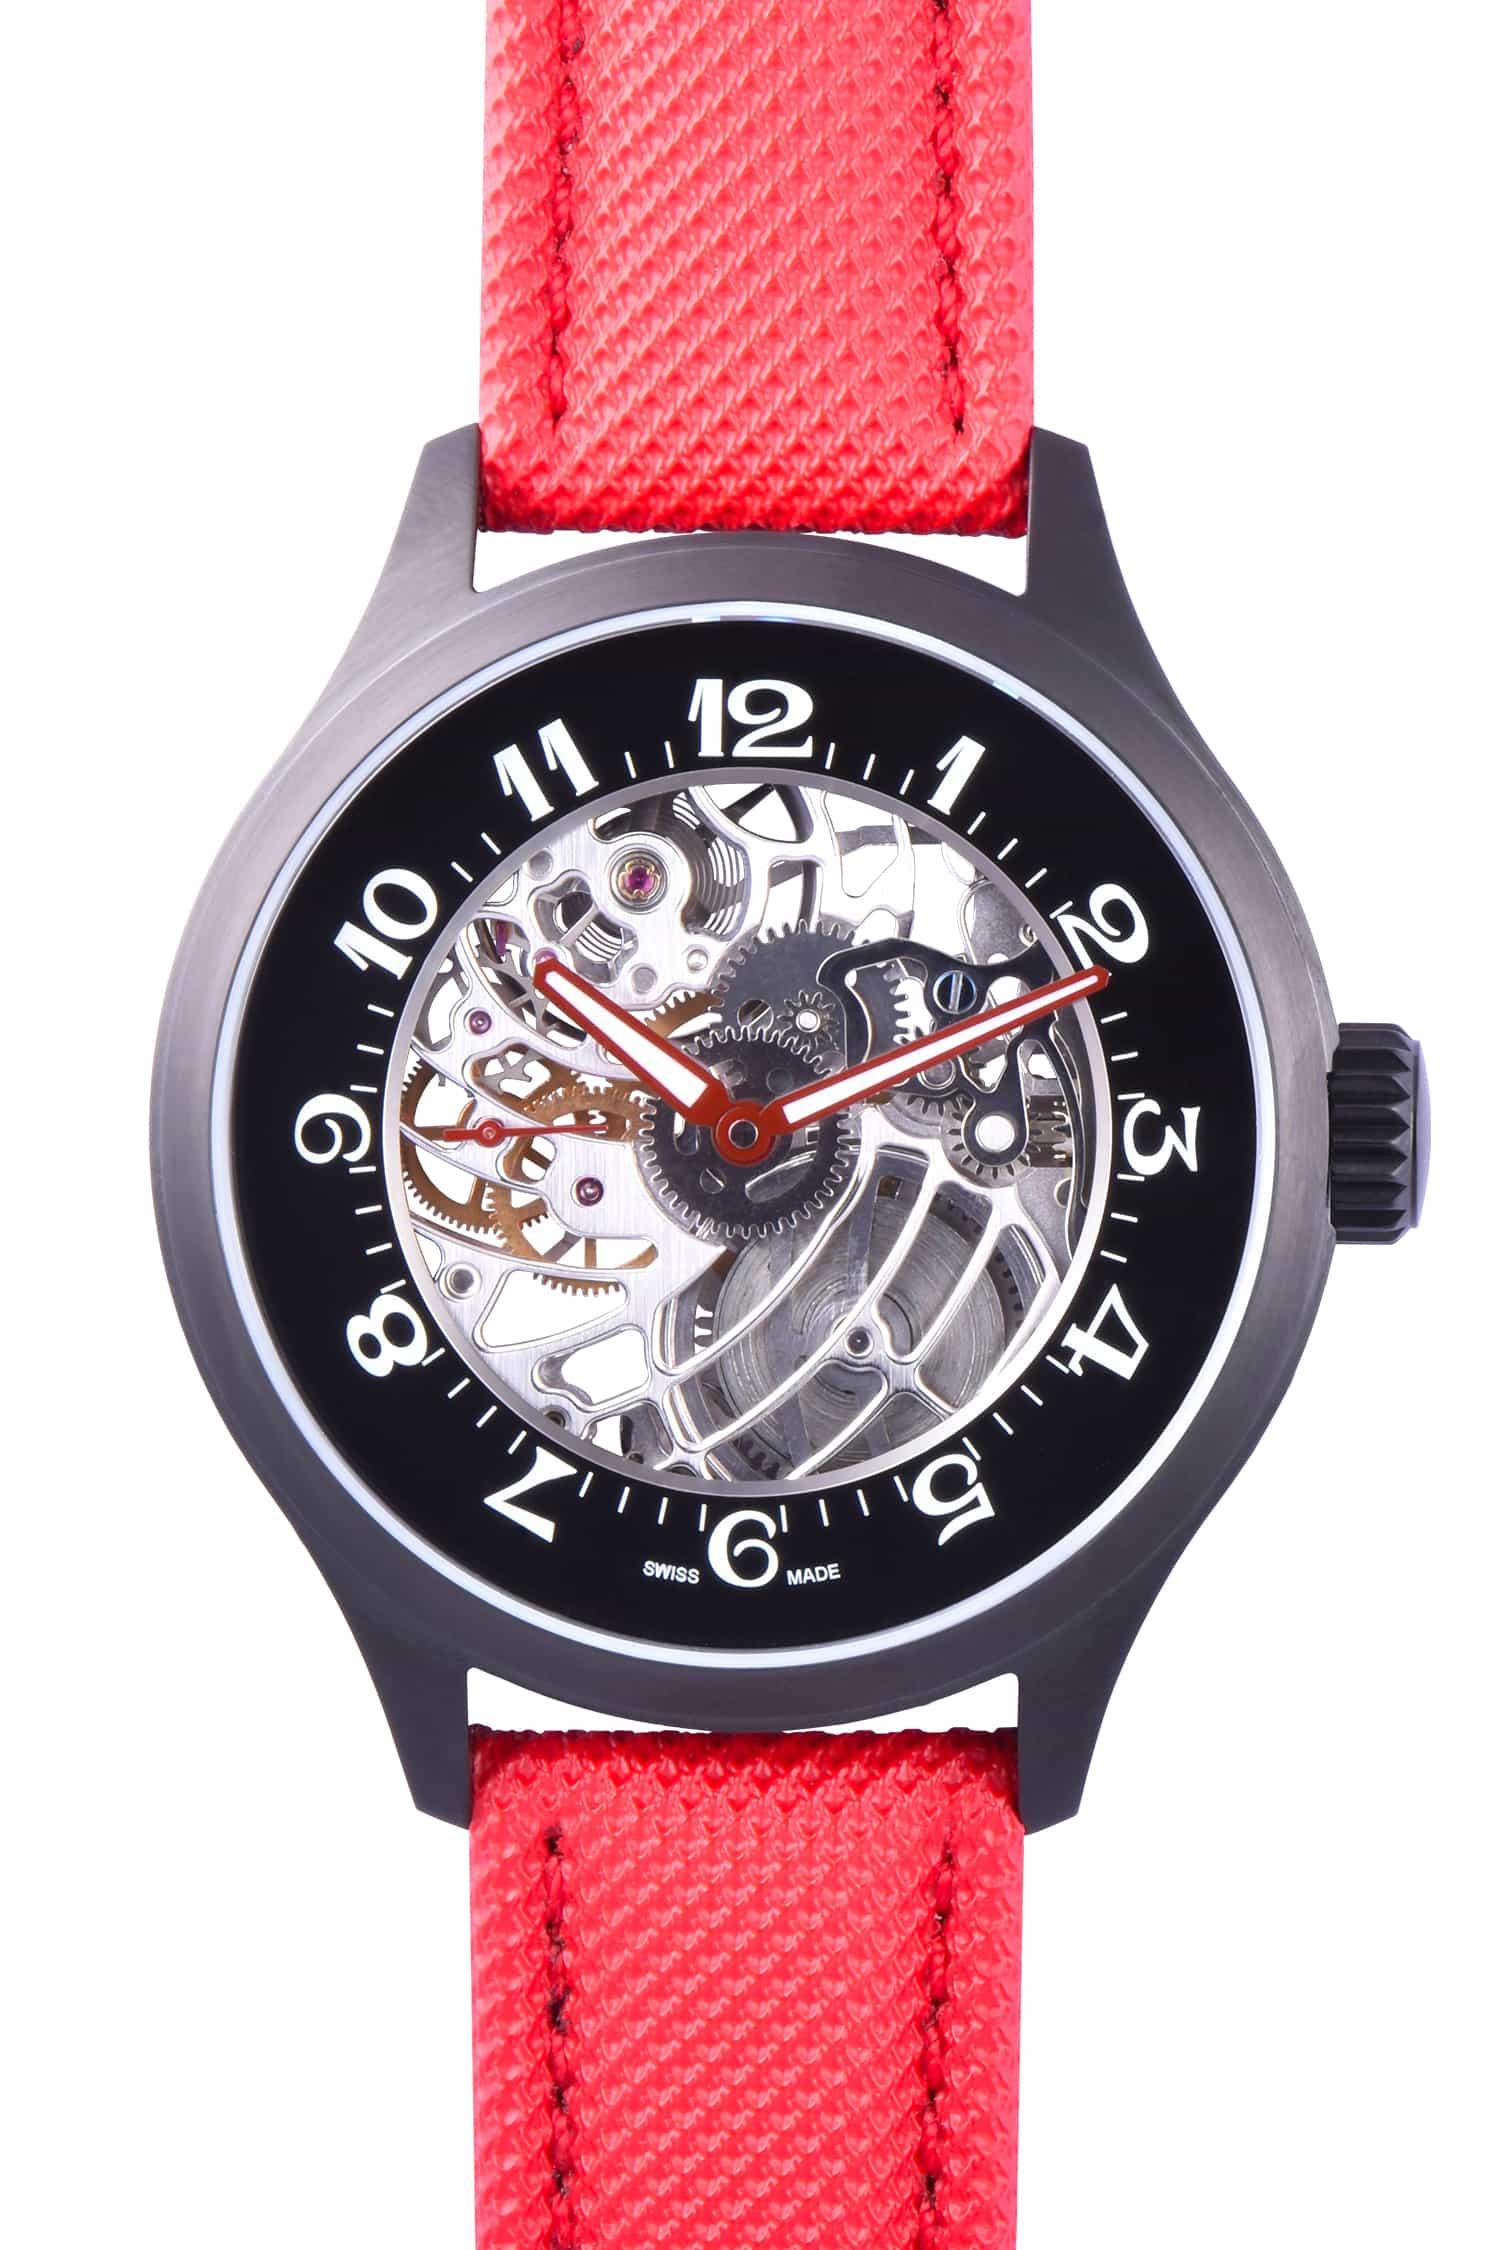 watch - Nicolas